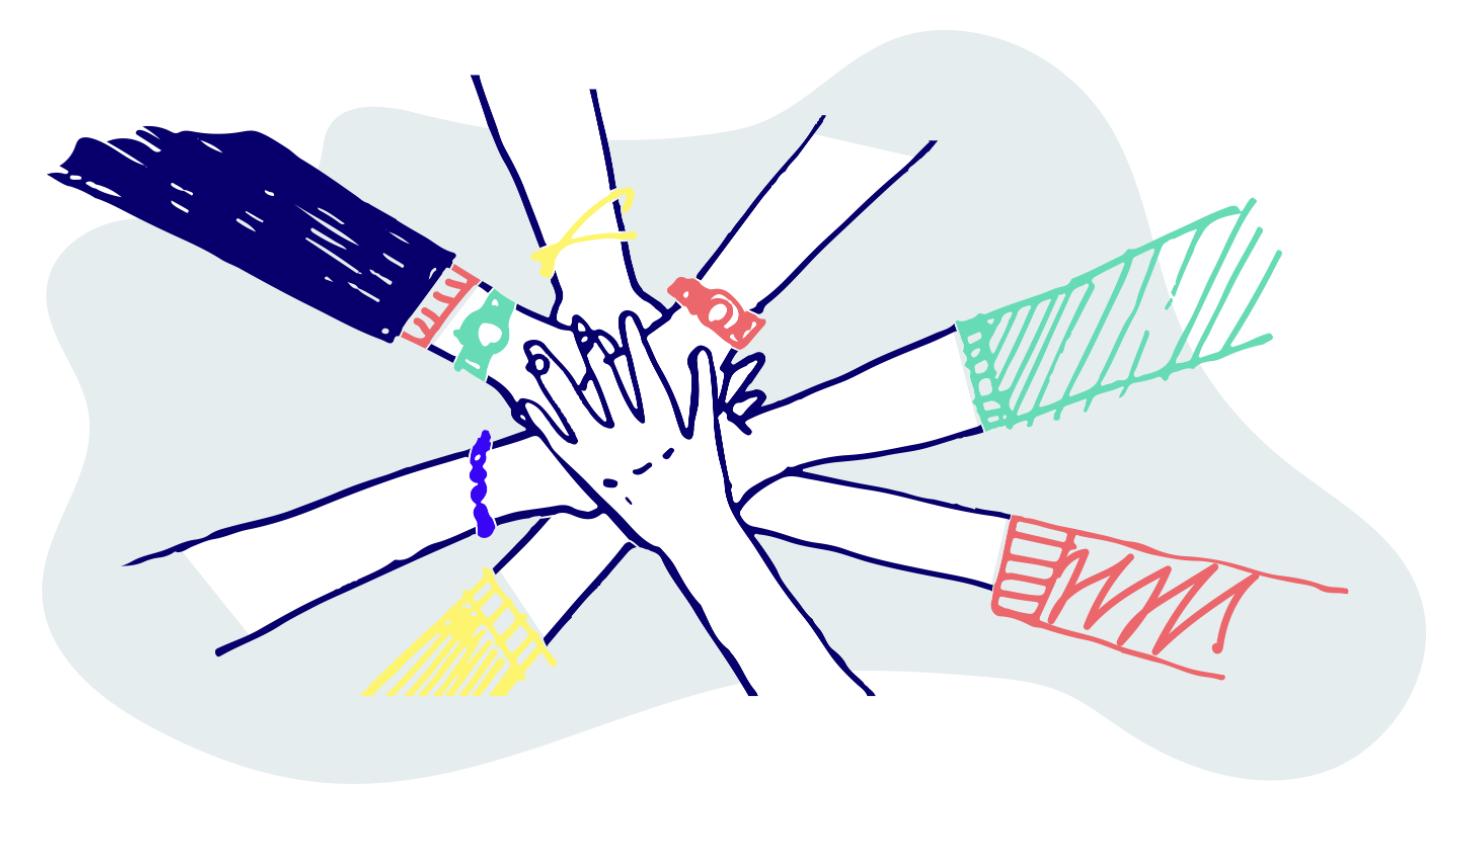 Review Comeet: Collaborative Hiring Platform - appvizer